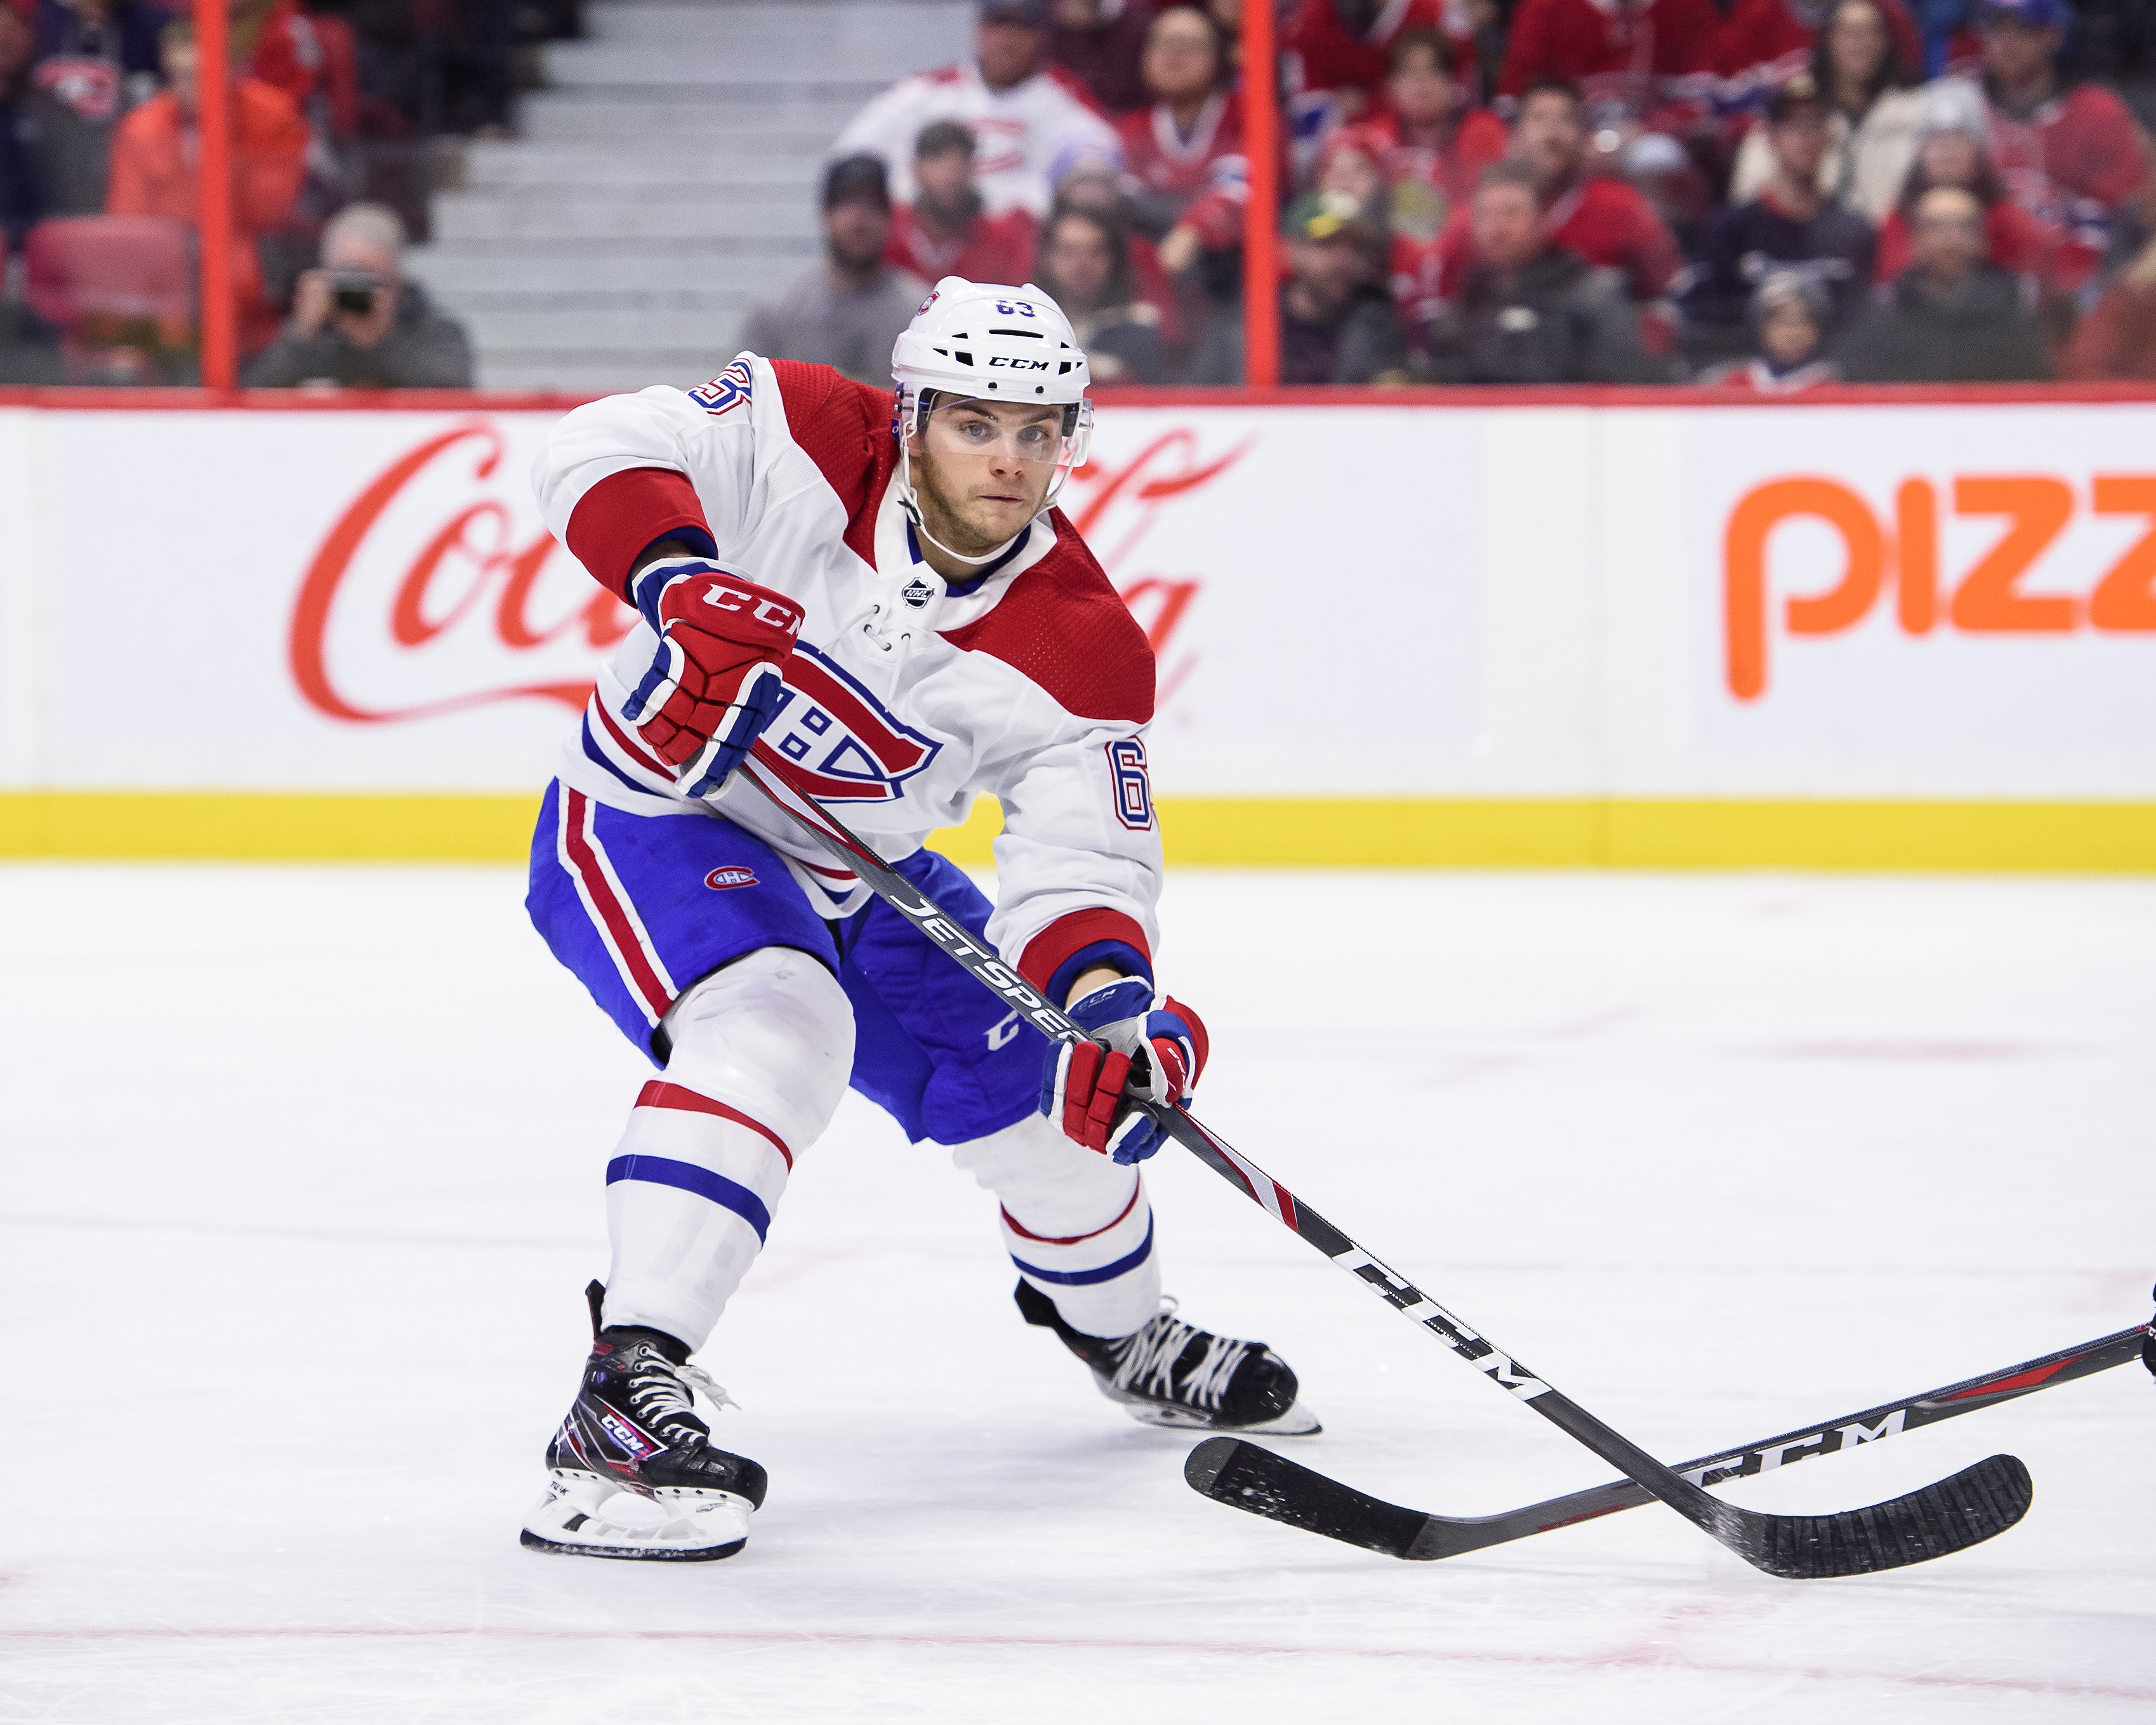 NHL: JAN 11 Canadiens at Senators